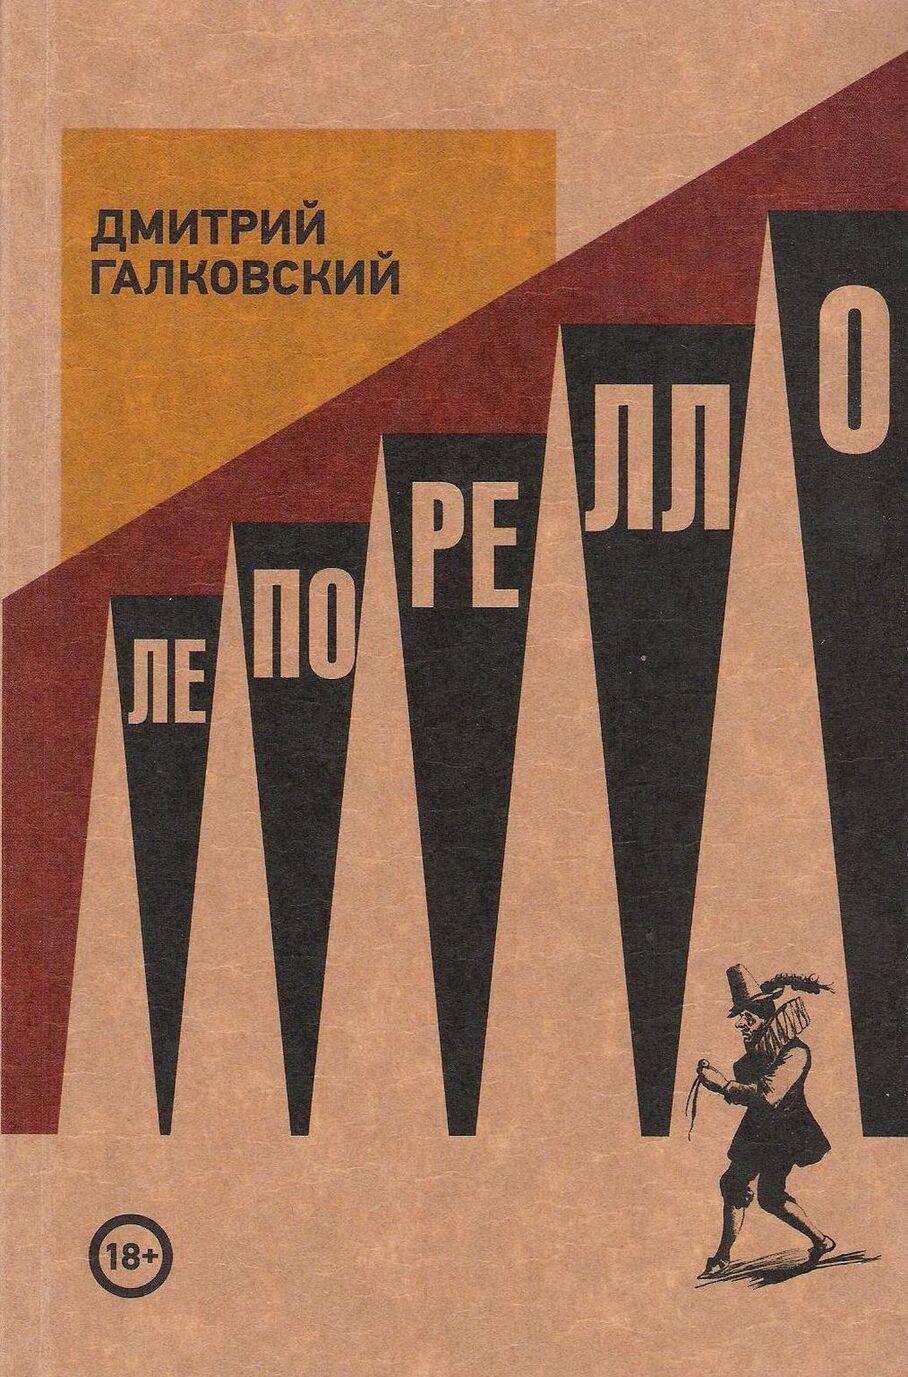 Leporello | Galkovskij Dmitrij Evgenevich